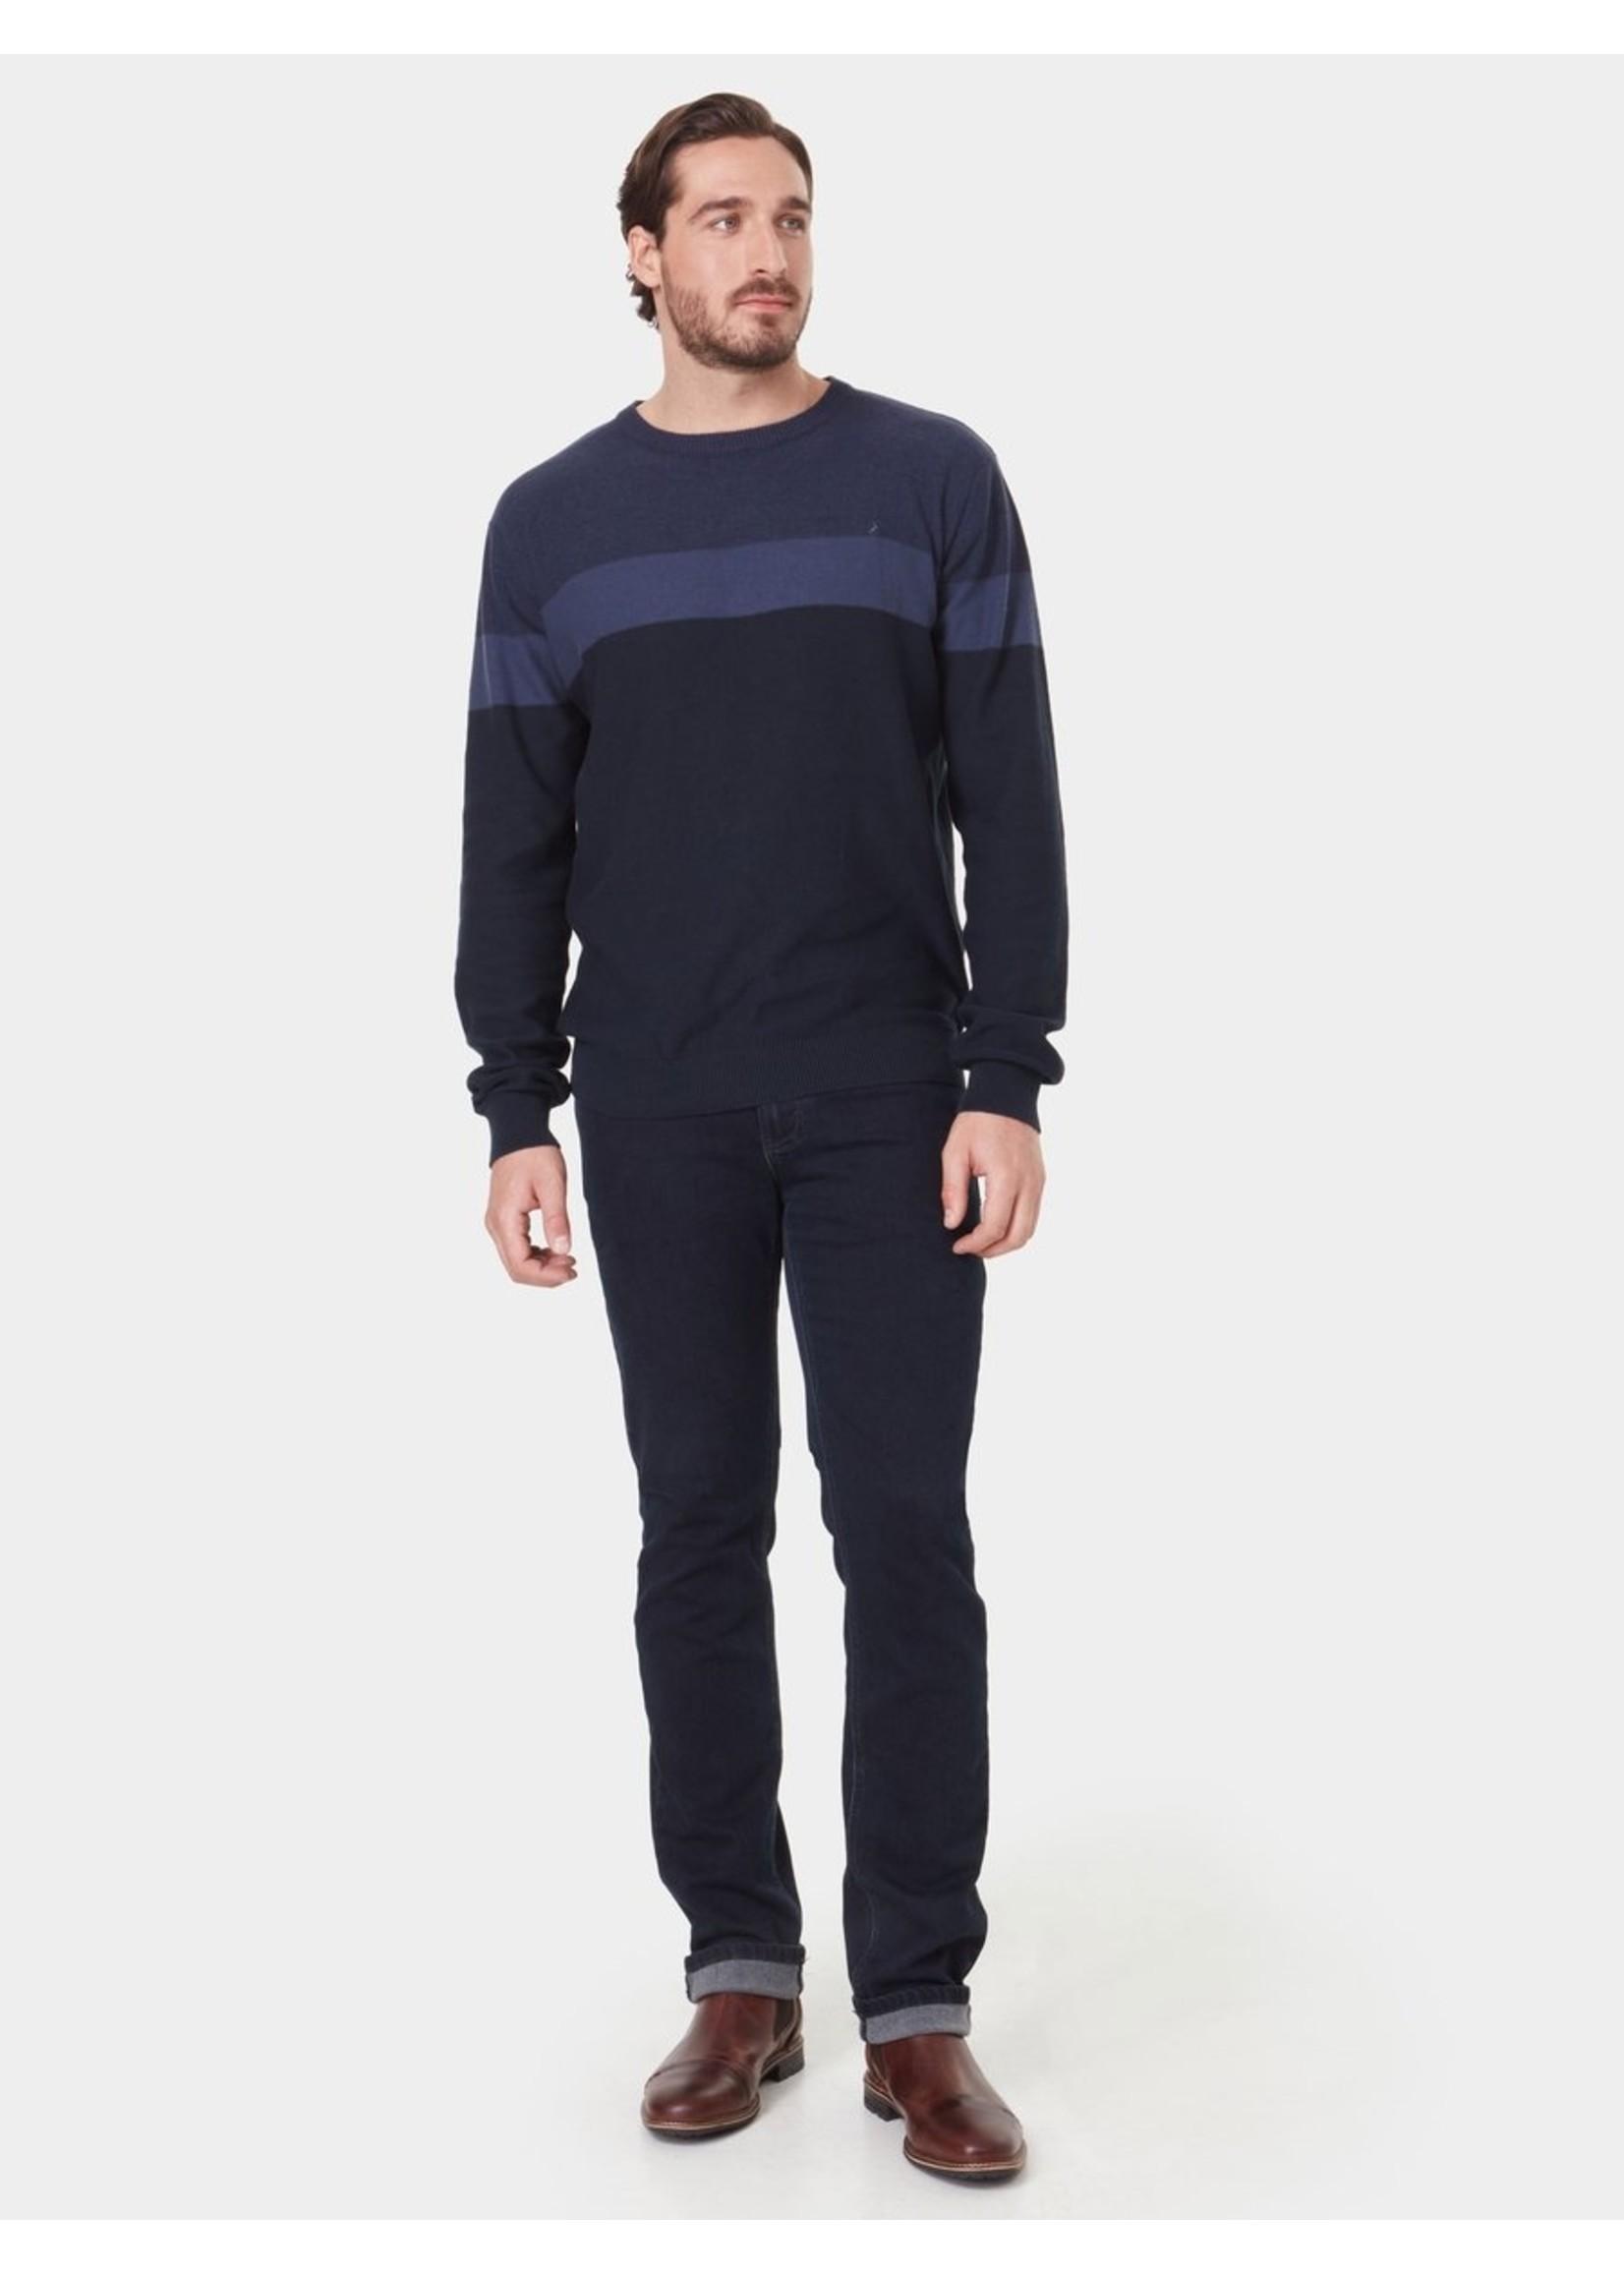 Mitch Men's Crew Neck Colour Block Sweater